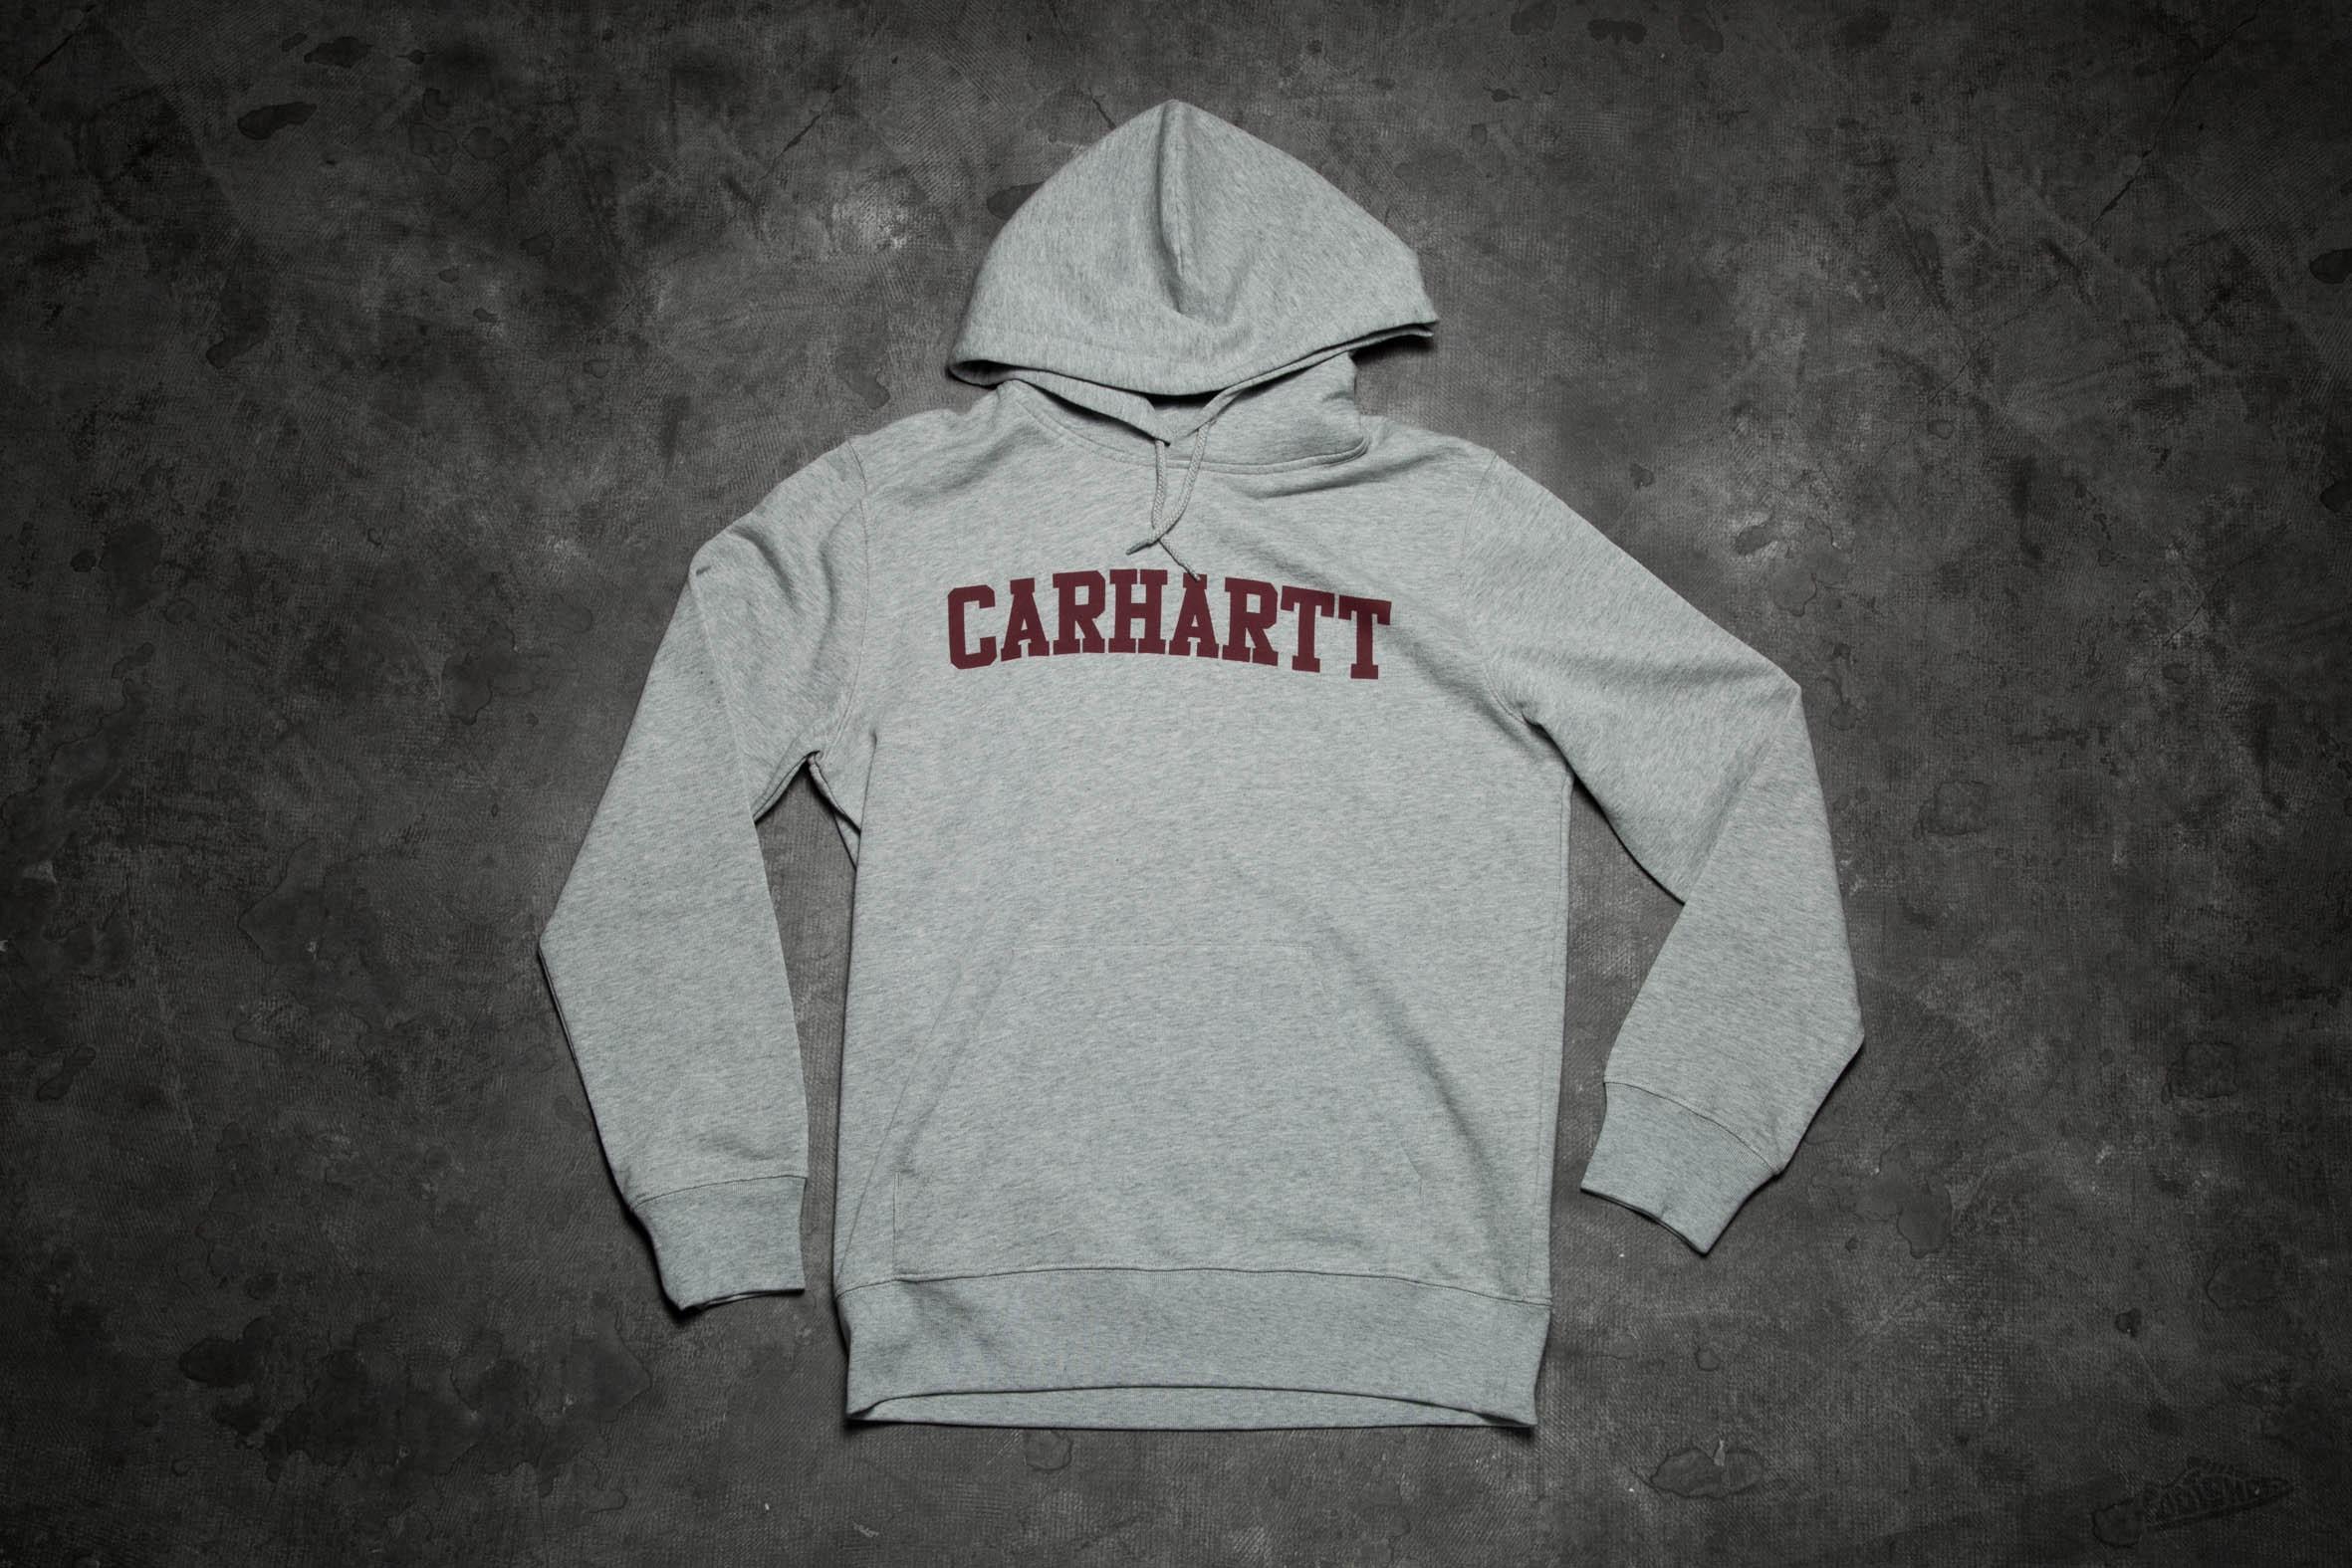 dfd9f341ddc Carhartt WIP Hooded College Sweatshirt Grey Heather/Cordovan ...